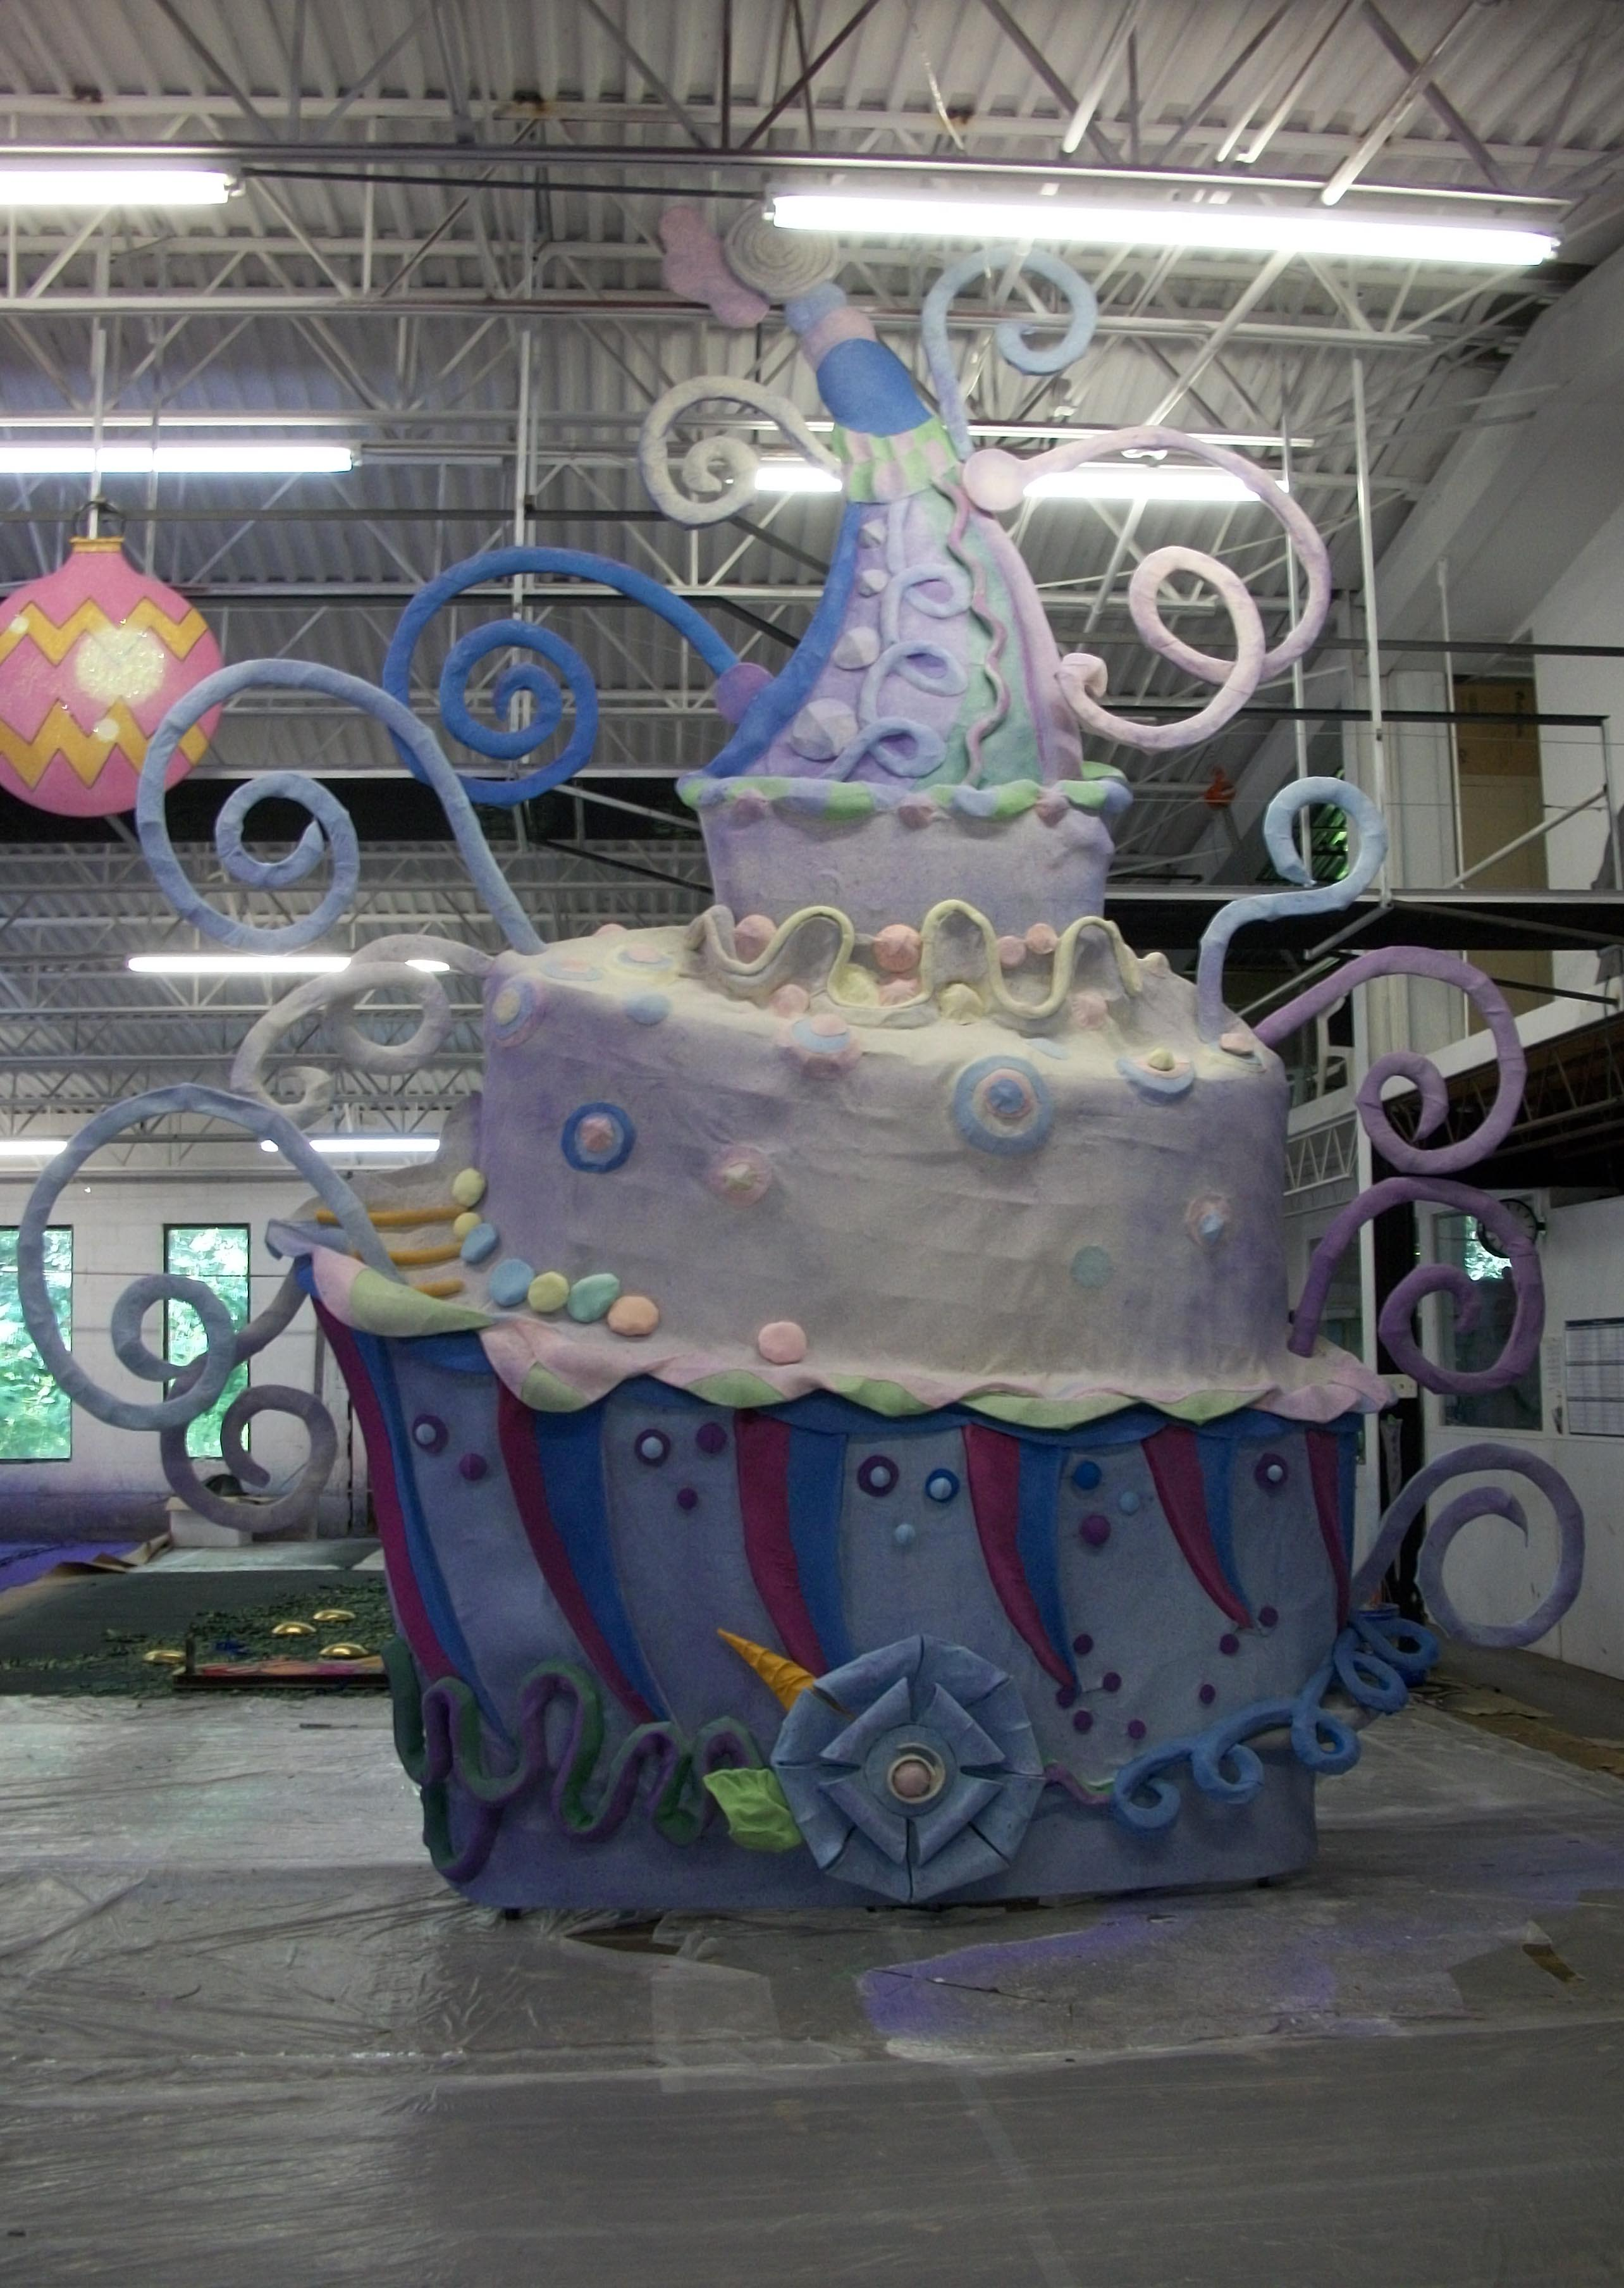 nutcracker_cake2.jpg